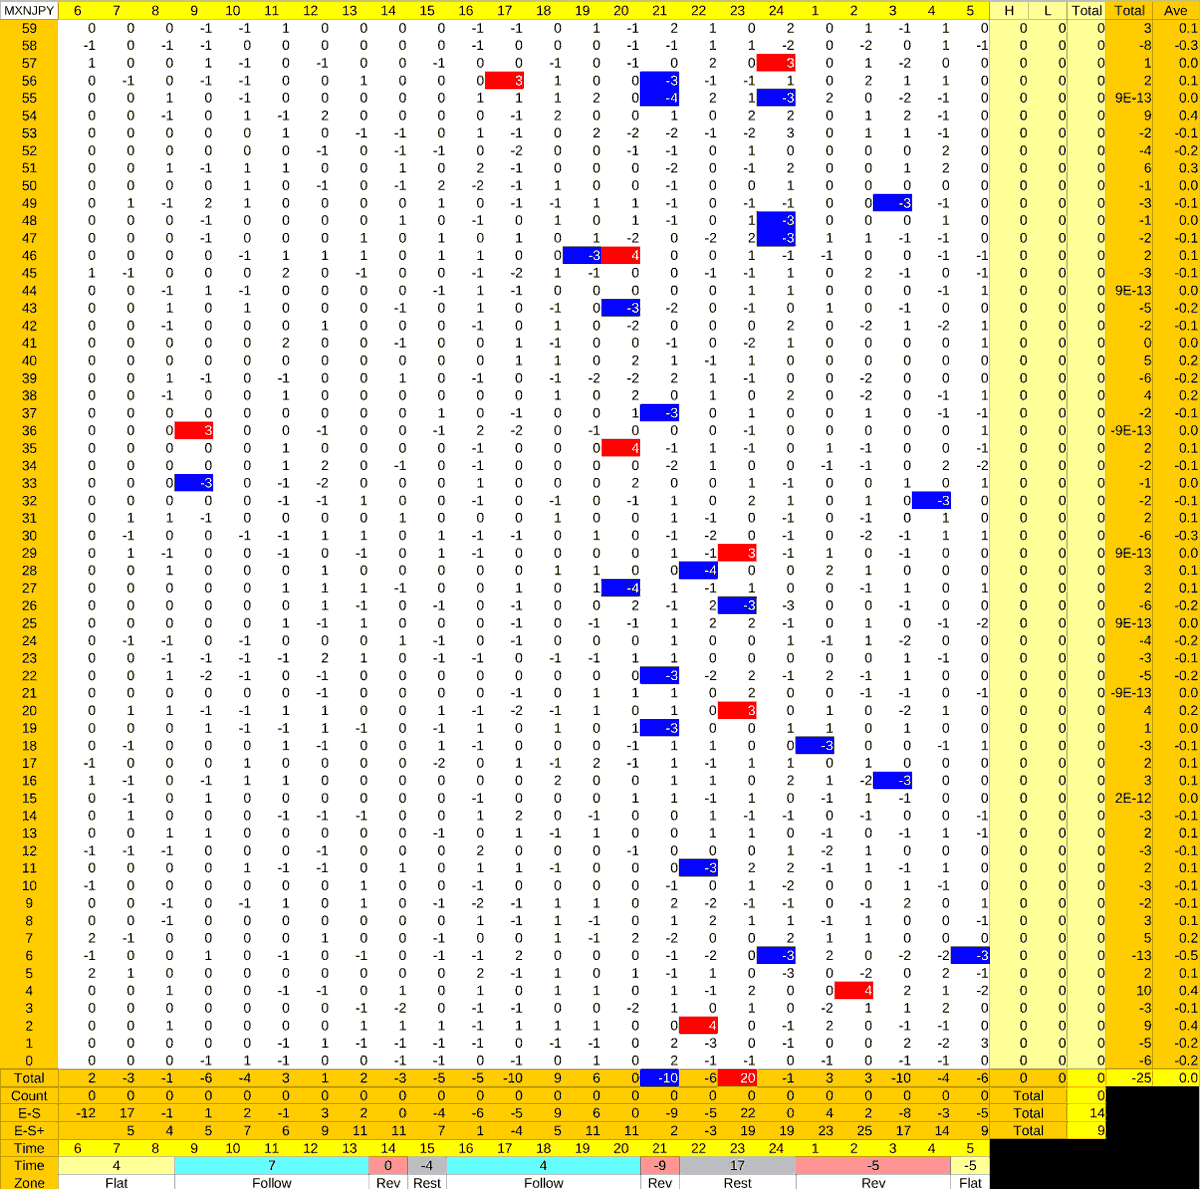 20210316_HS(3)MXNJPY